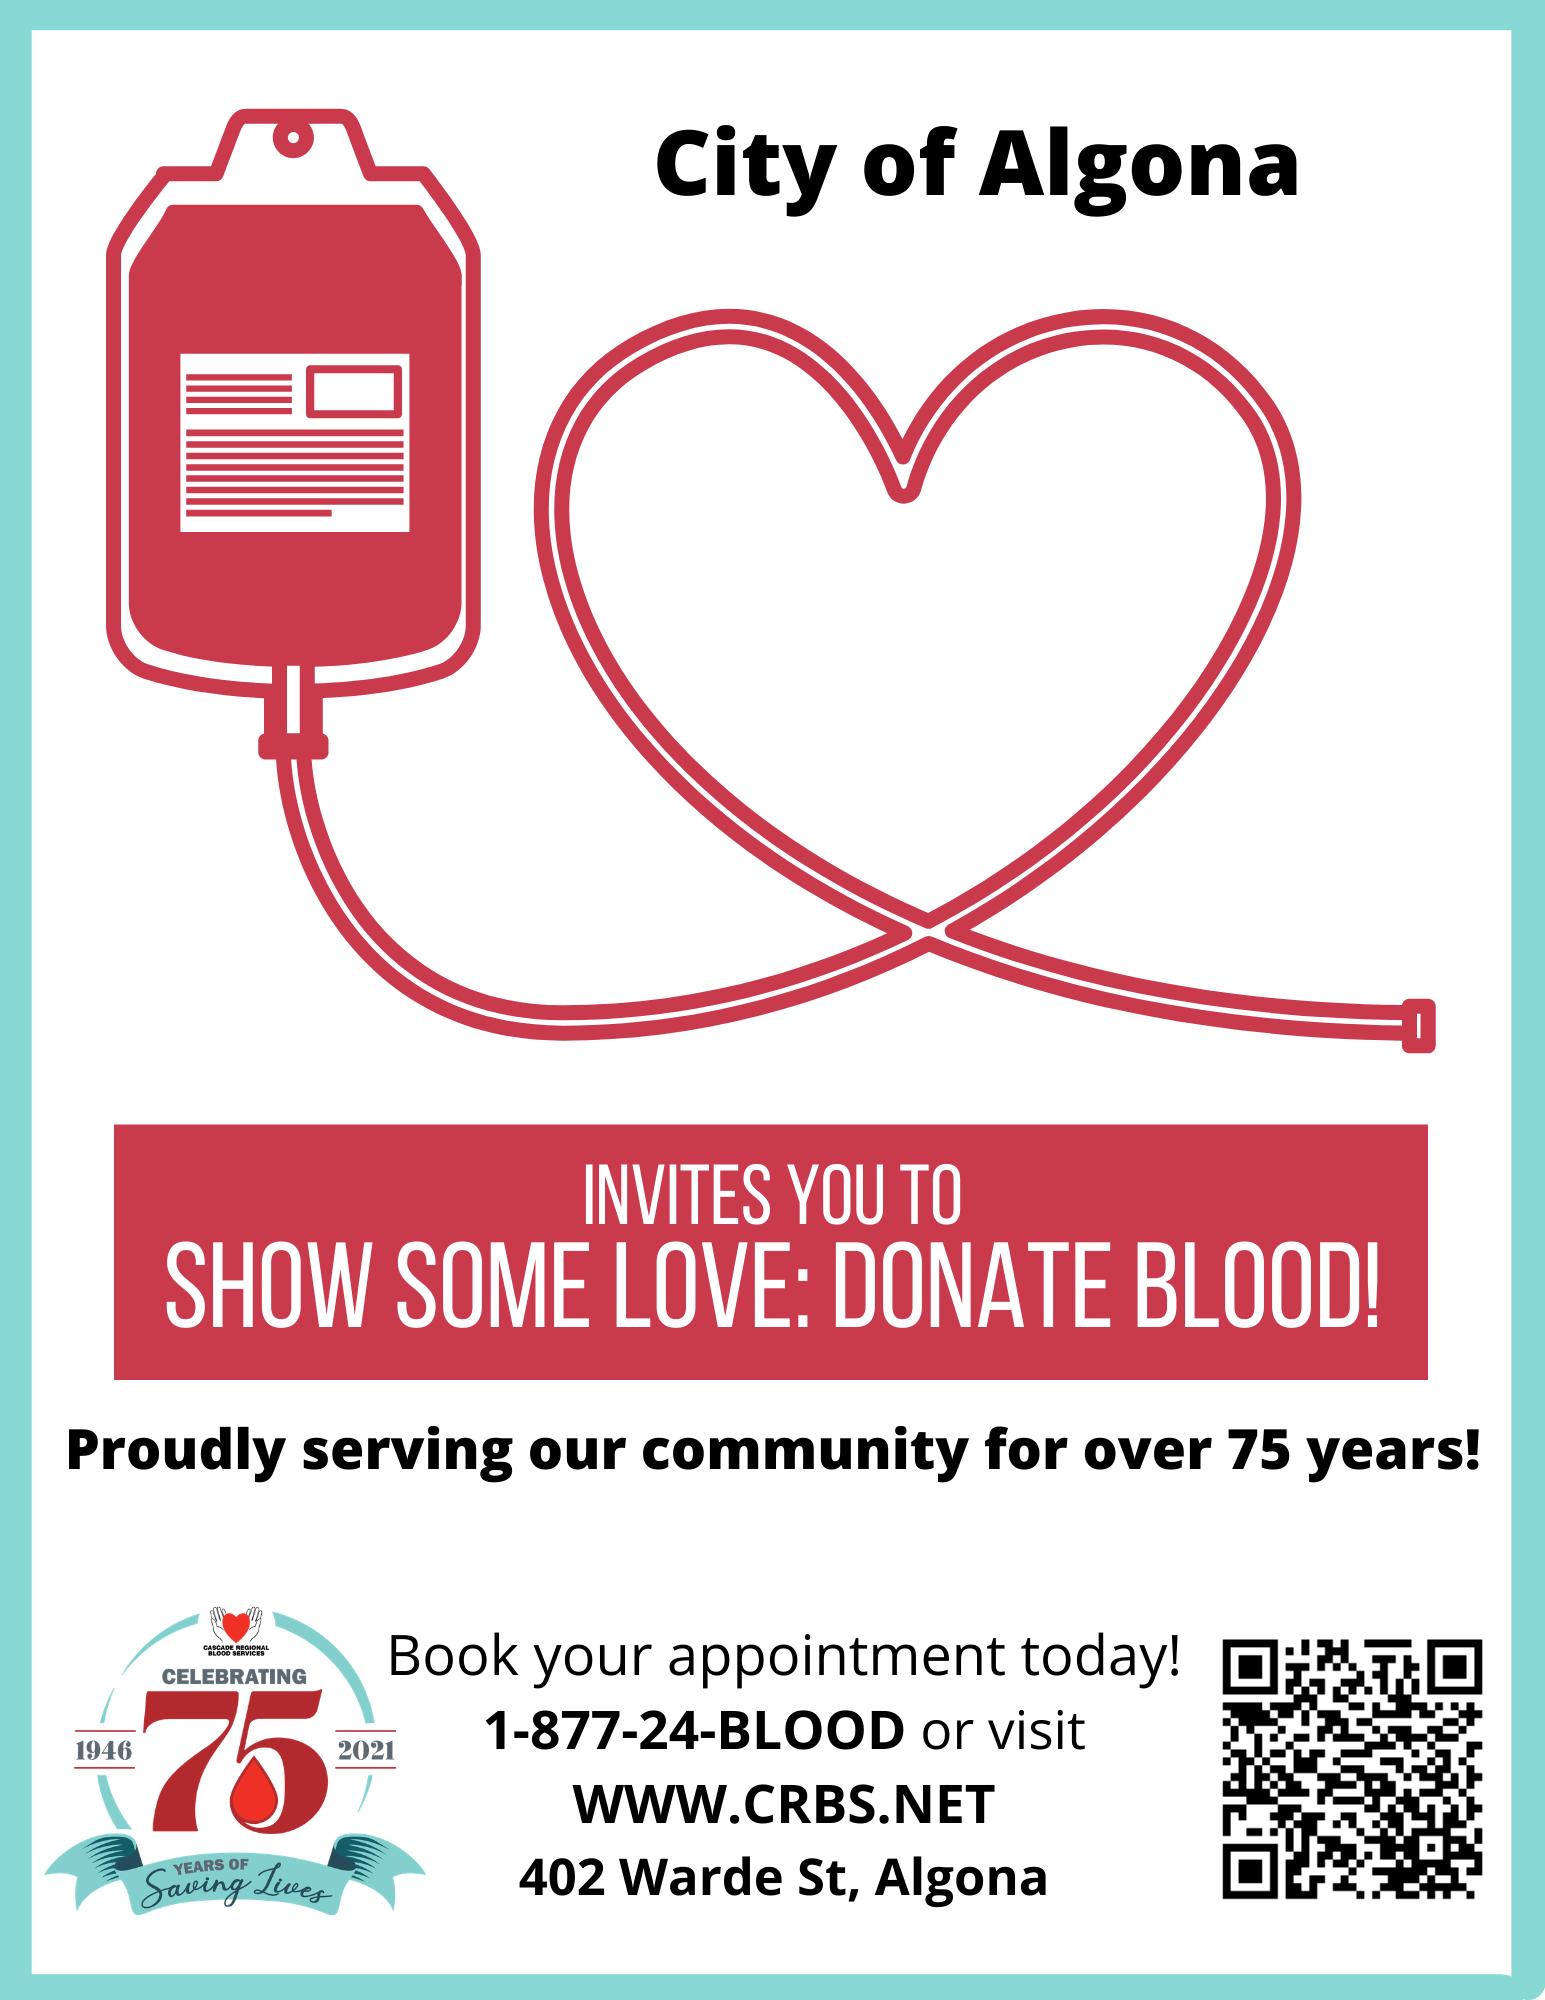 City of Algona - 2021 Mobile Blood Drive